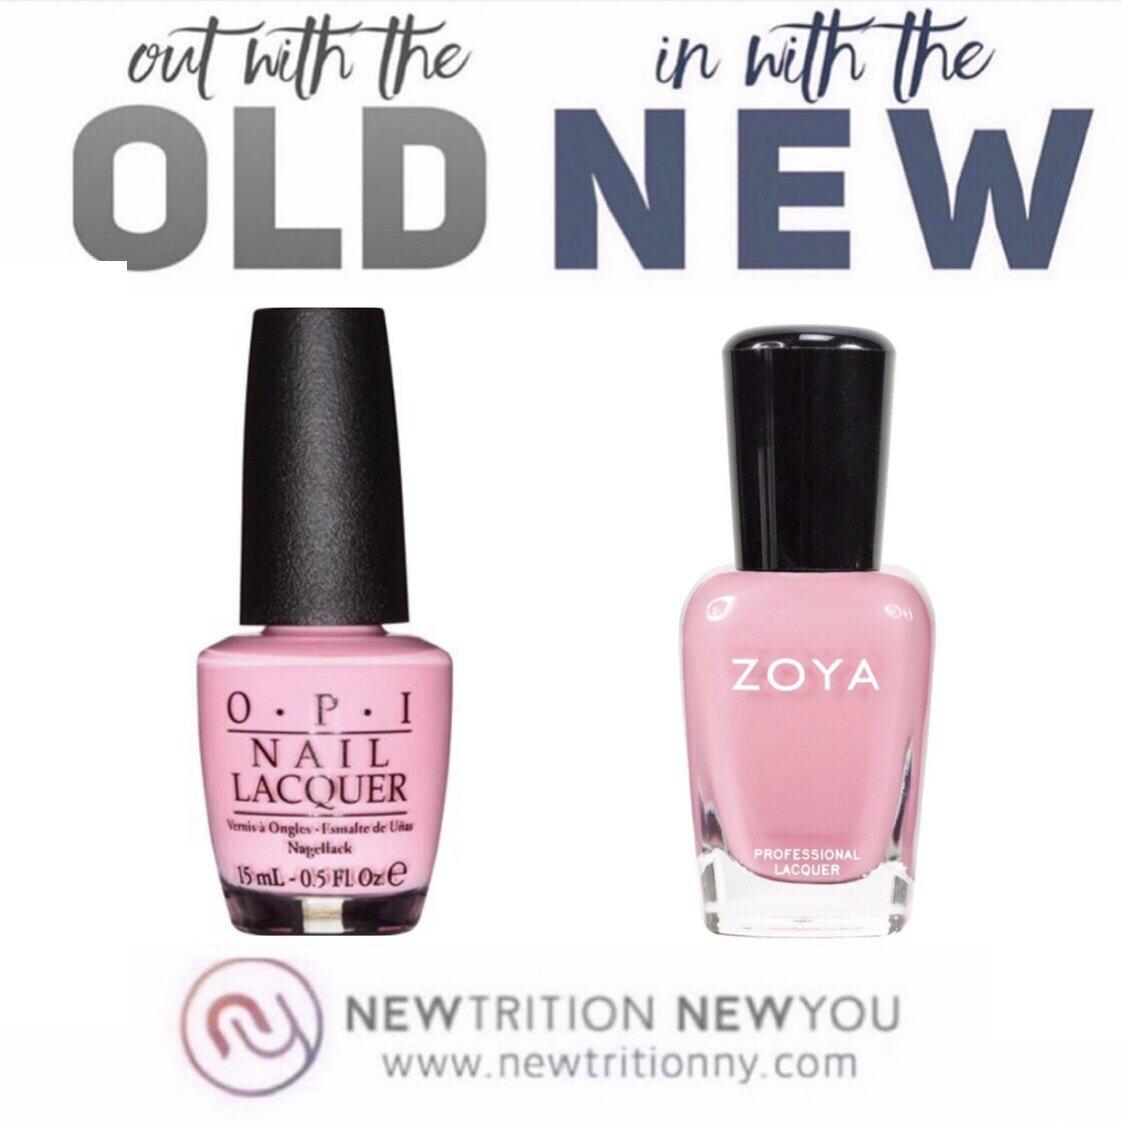 Clean Swap your nail color - Zoya Non Toxic Nail Polish Colors